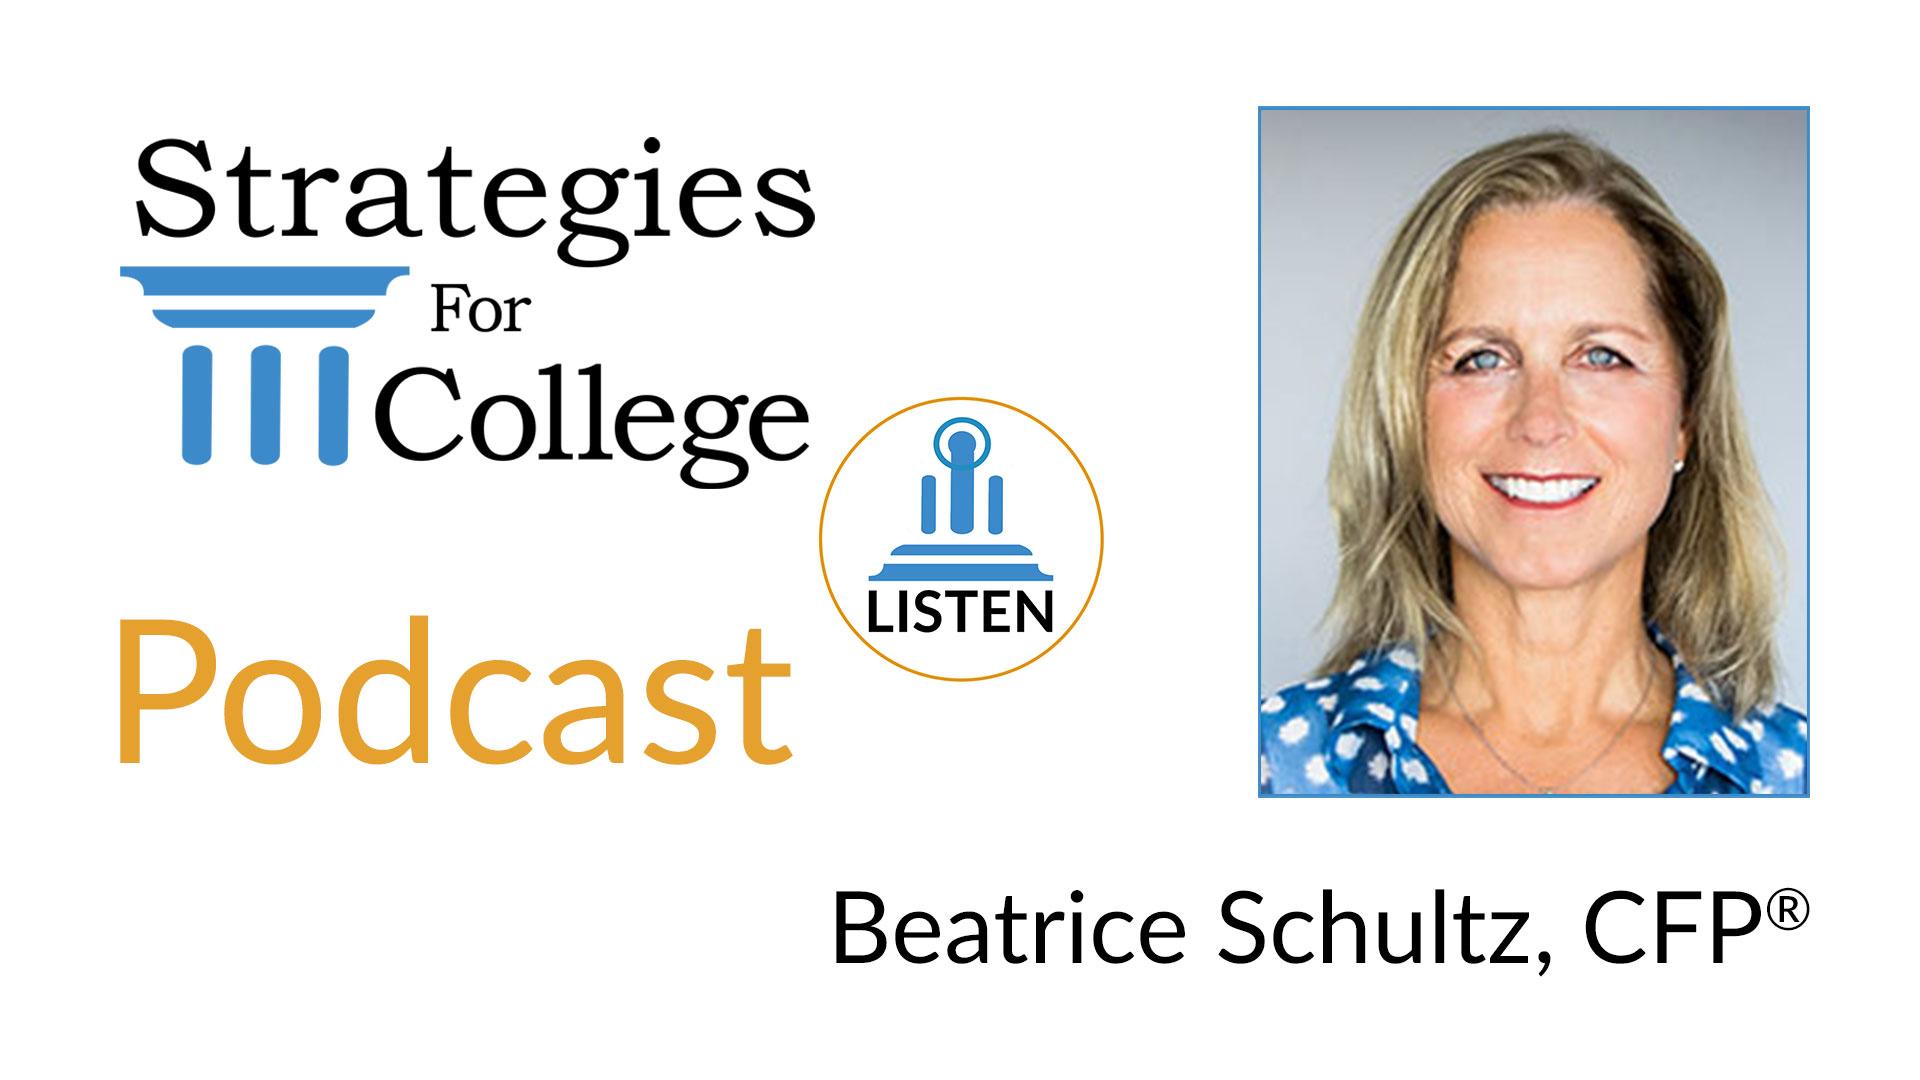 Podcast: Beatrice Schultz